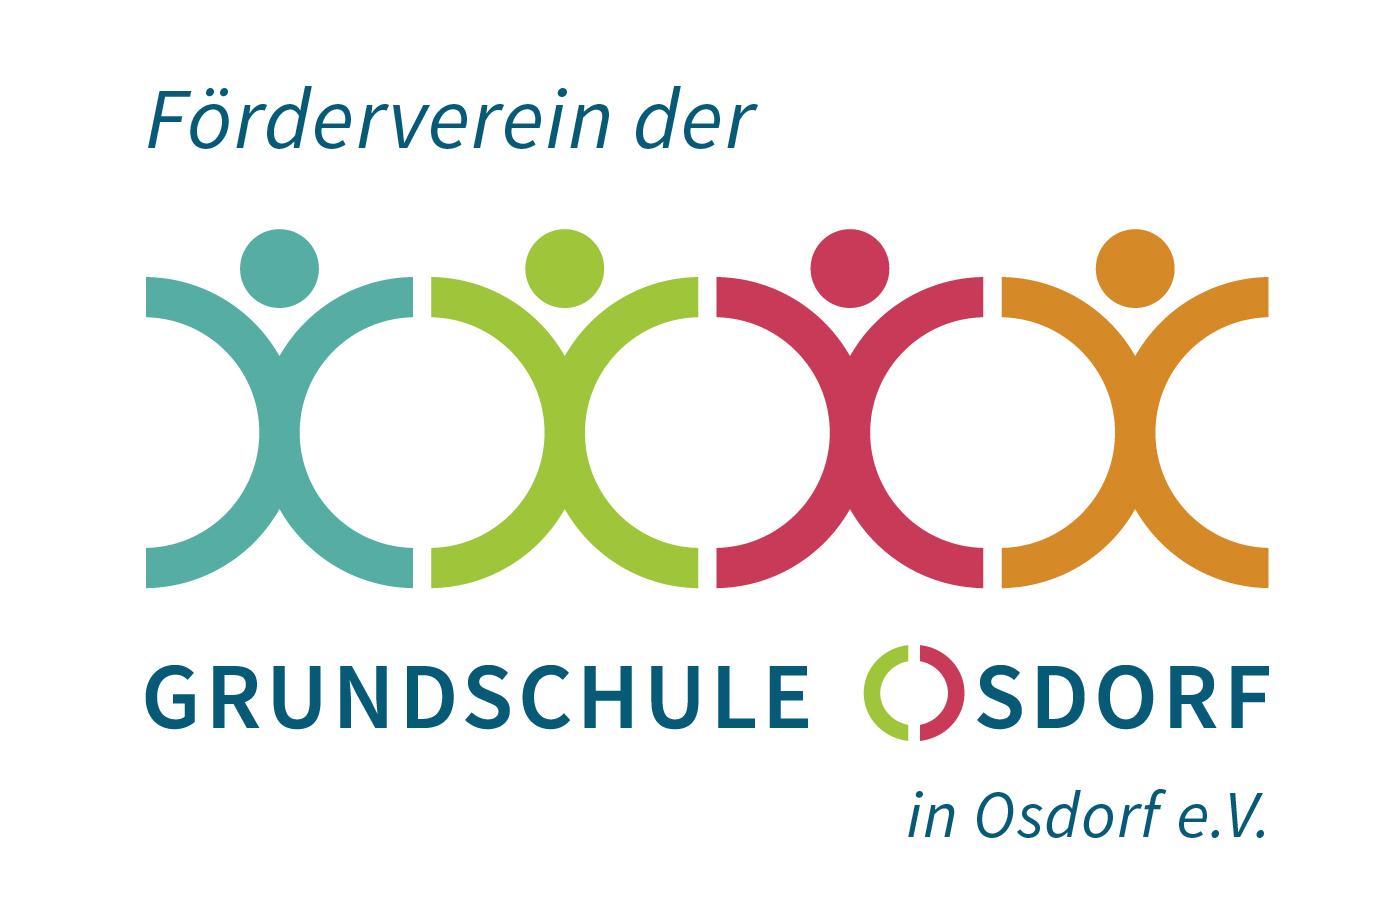 logo-foerderverein_grundschule-osdorf_rgb